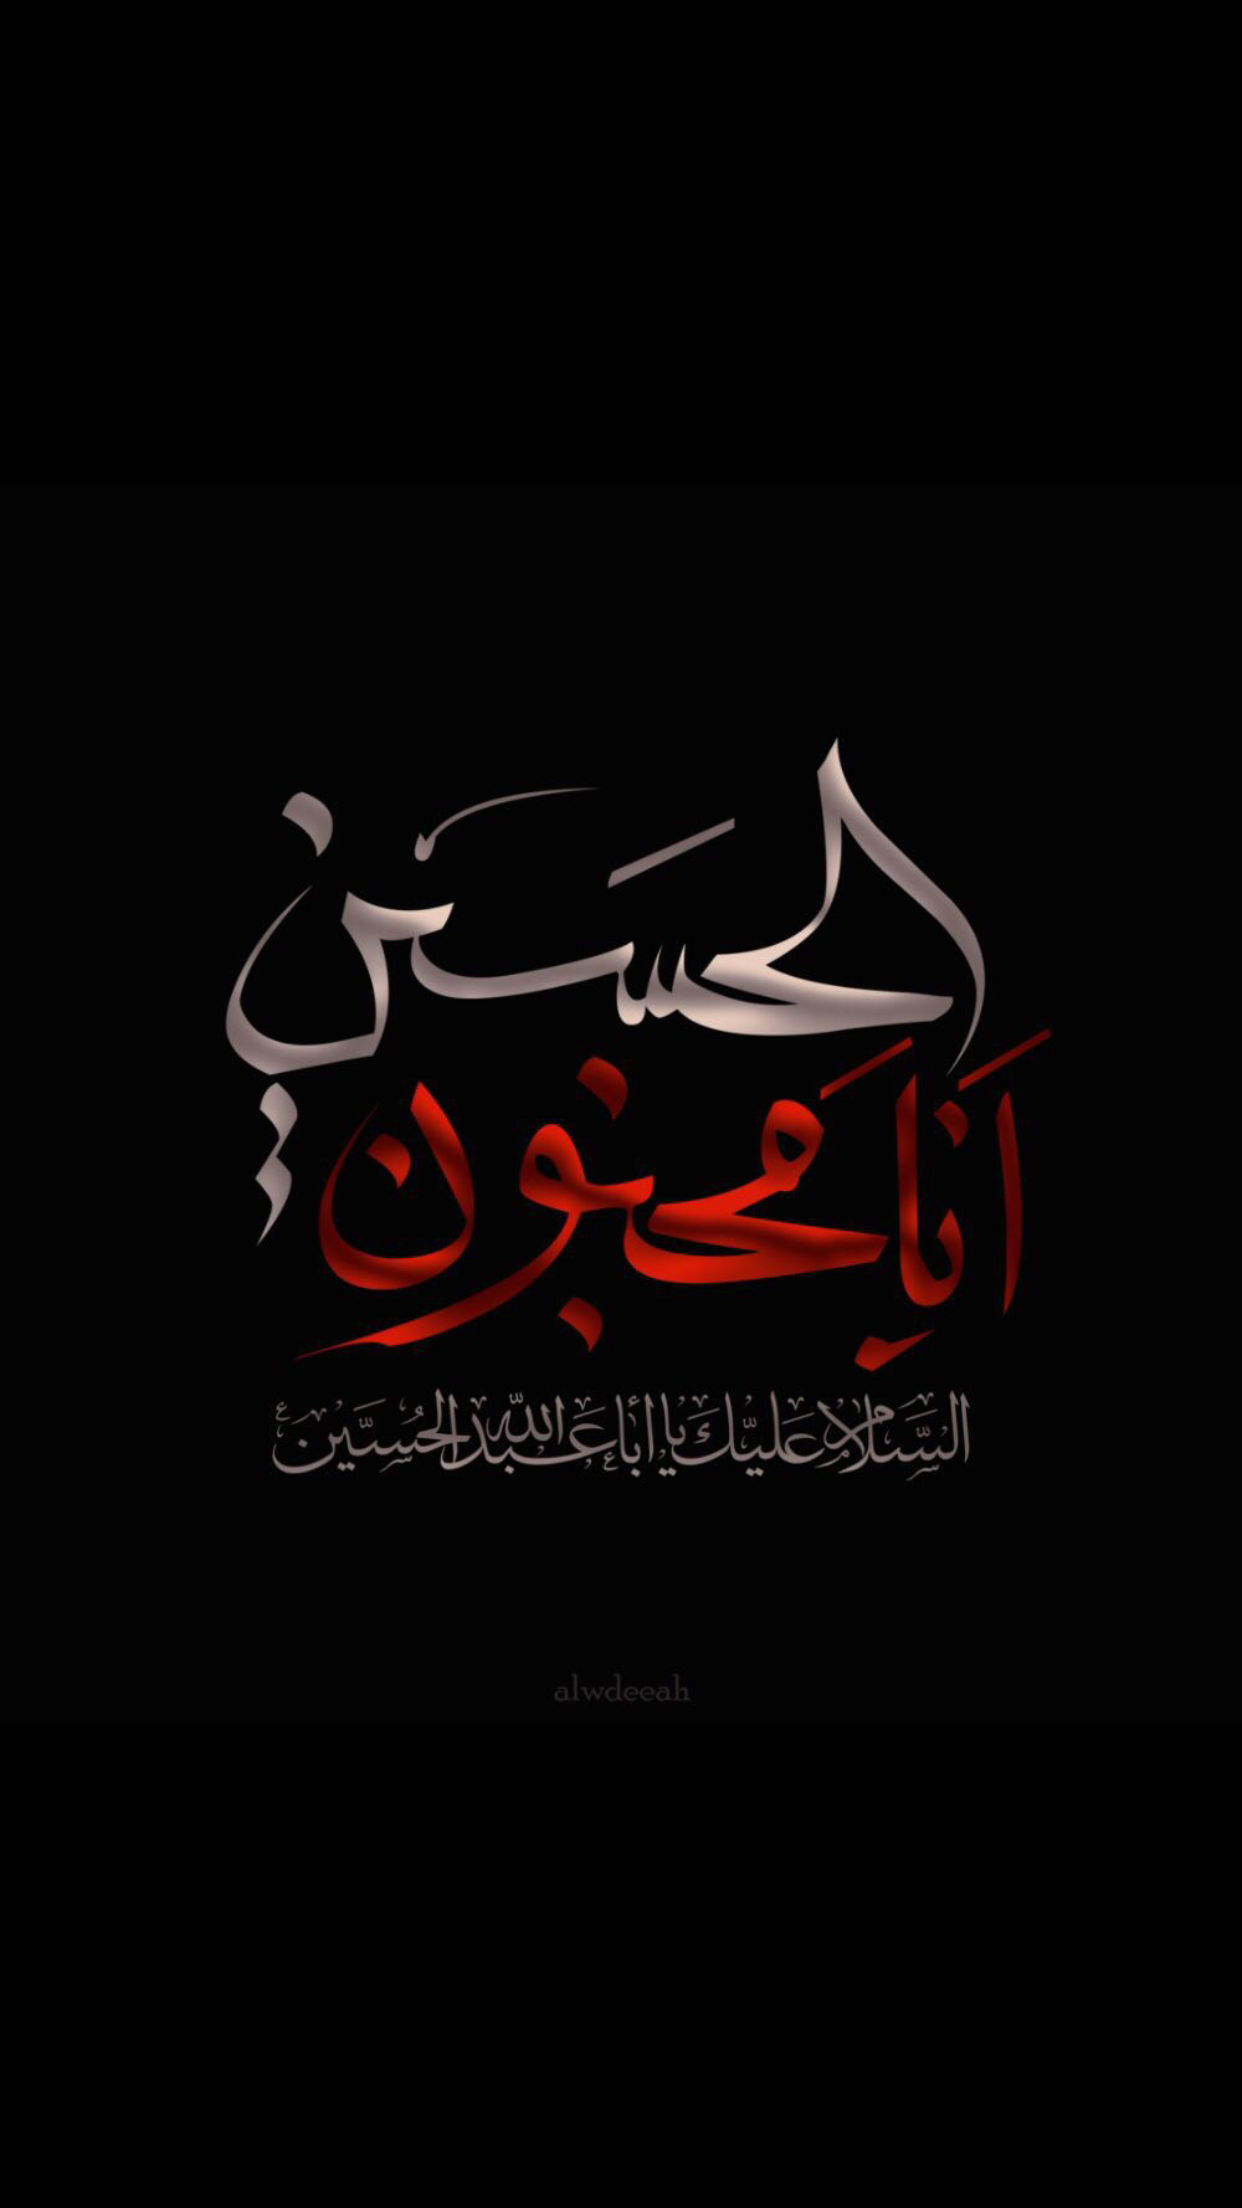 Tulisan Innalillahi Yang Benar : tulisan, innalillahi, benar, Kaligrafi, Innalillahiwainnailaihirojiun, Cikimm.com